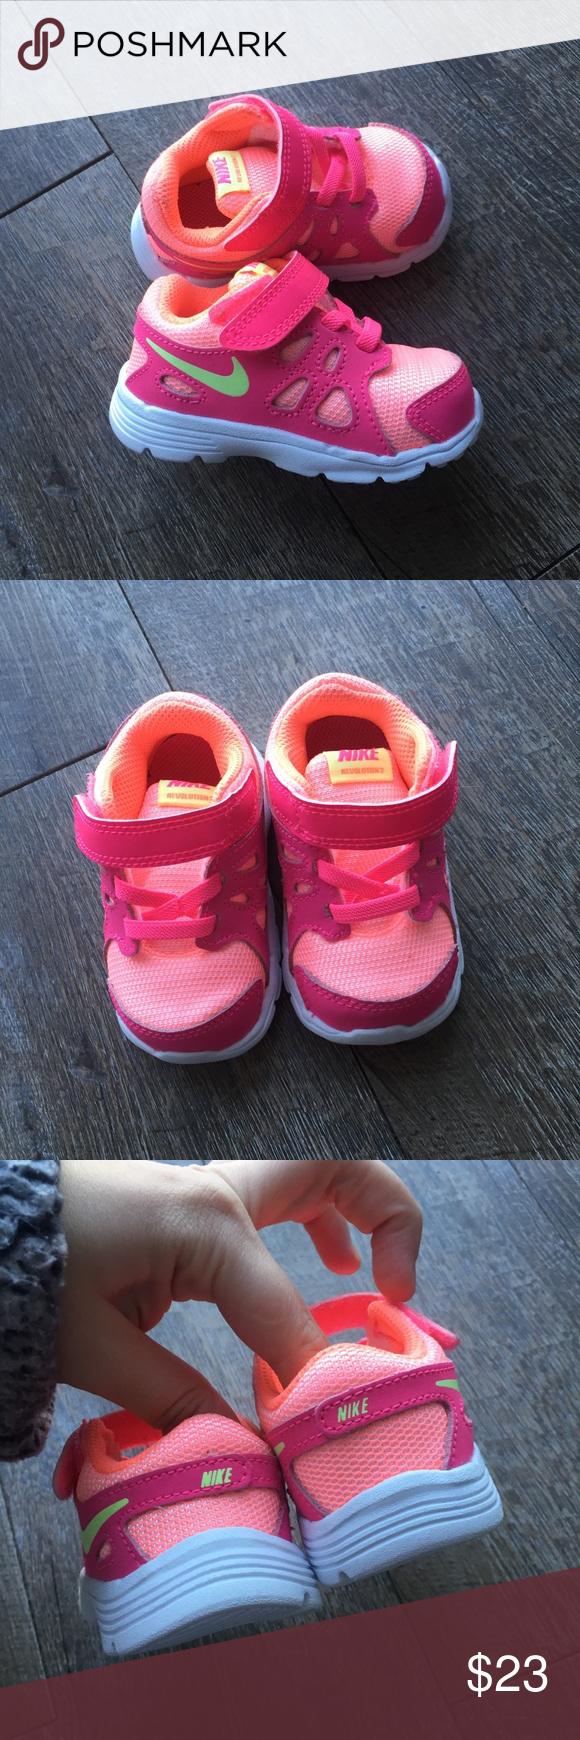 Girls sneakers, Baby girl nike, Neon